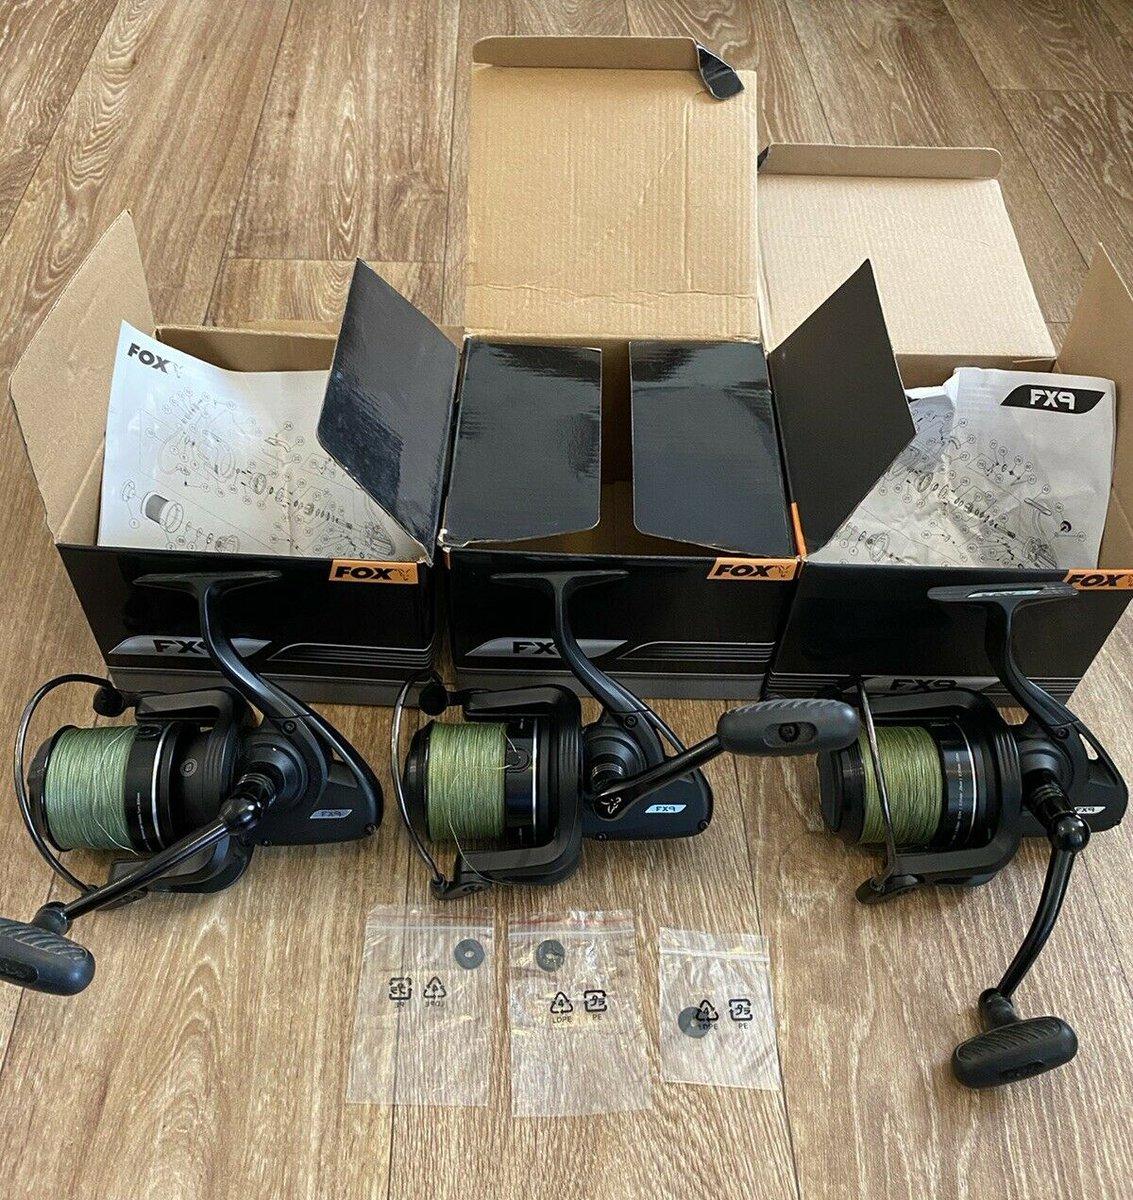 Ad - Fox FX9 Carp Fishing Reels x3 On eBay here -->> https://t.co/TzOWasX8lc  #carpfishing #fi